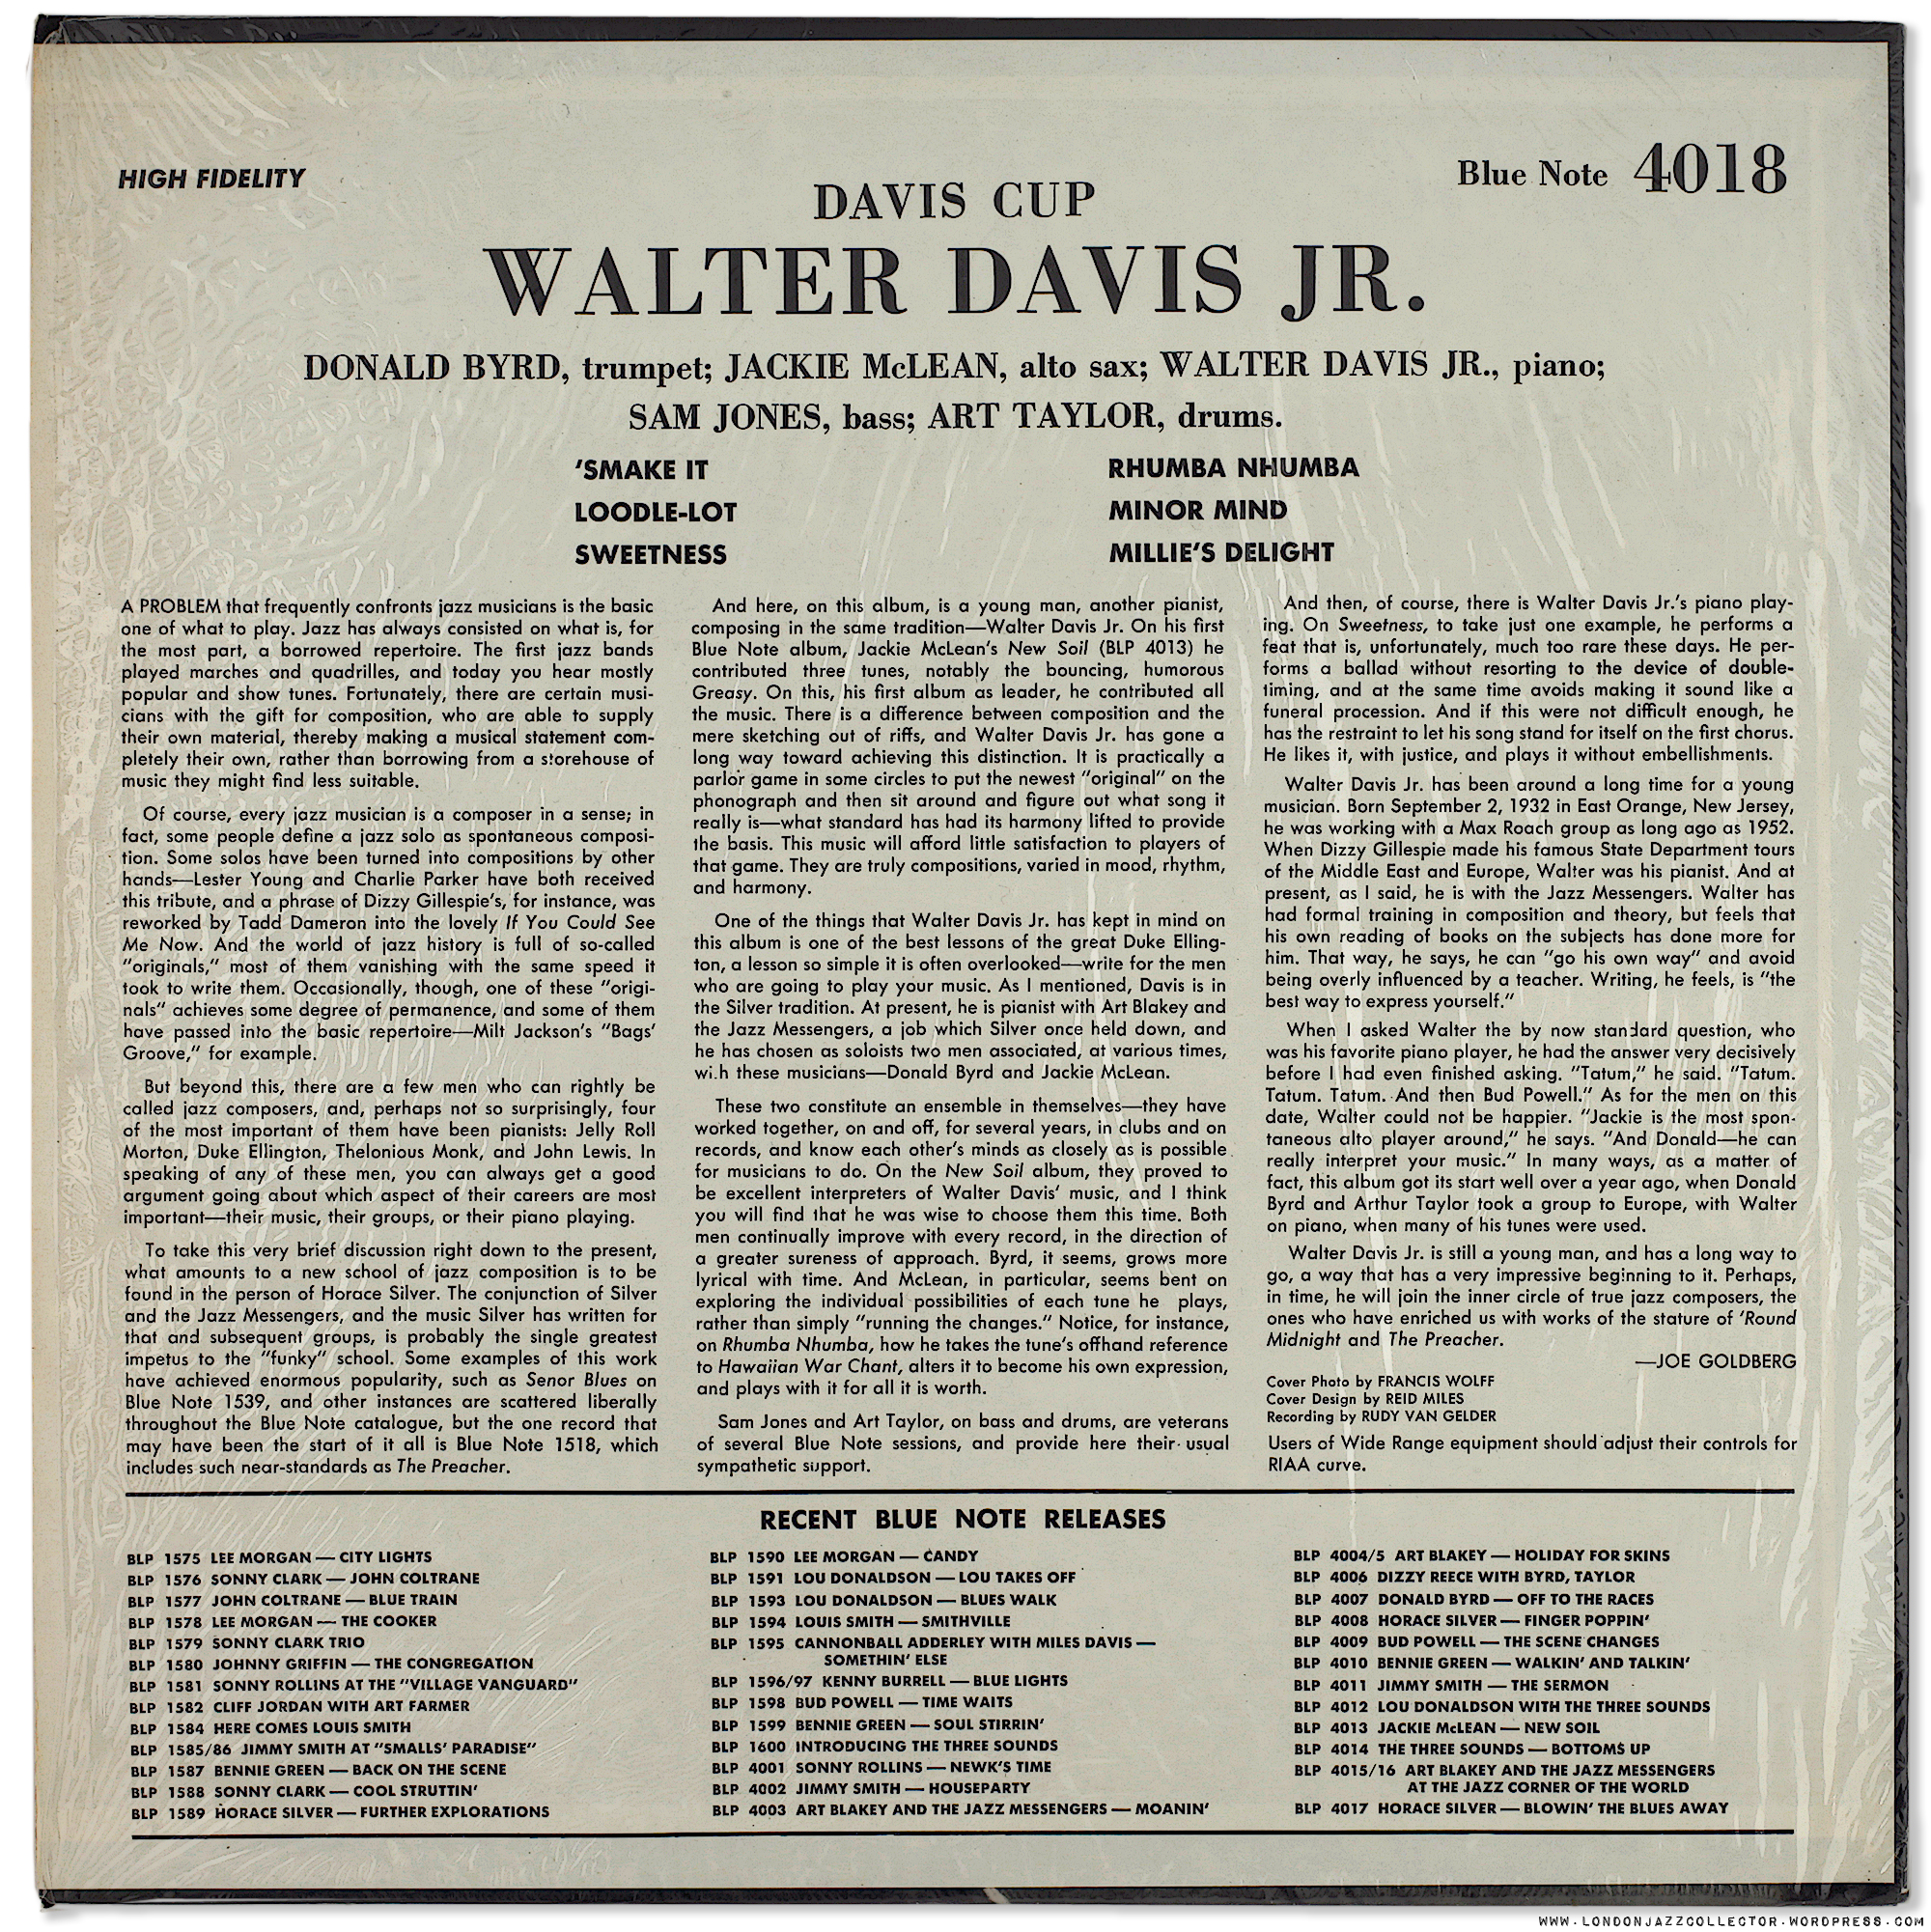 Walter Davis Jr Davis Cup 1959 Blue Note UA